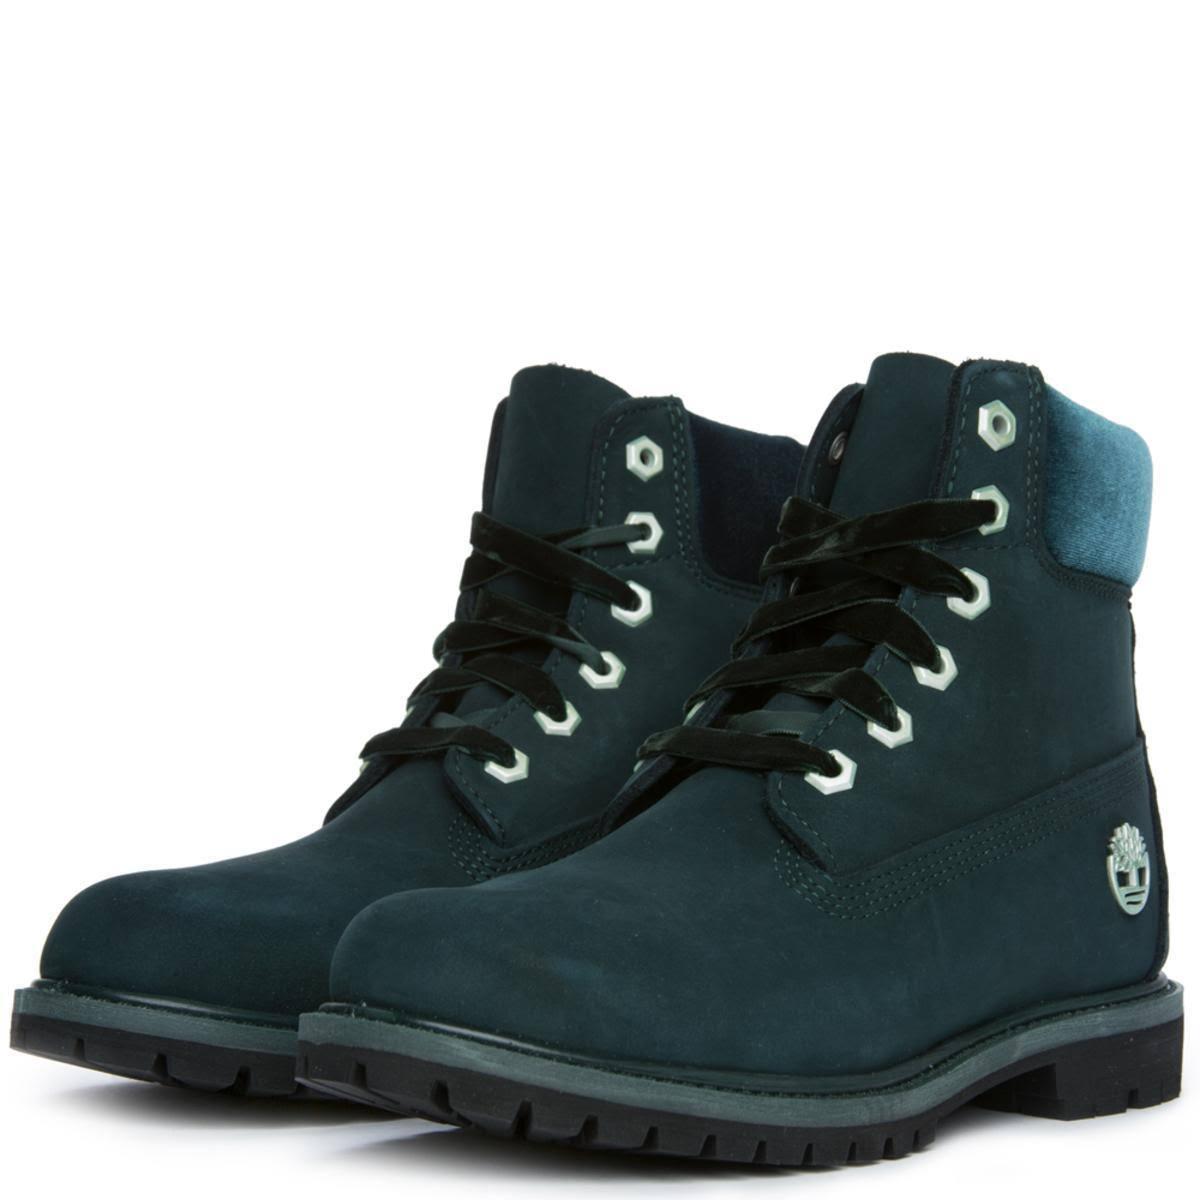 Double Sole Velvet Timberland Women Premium Boots Sz5 5 6inch verde impermeabile lJTK3F1c